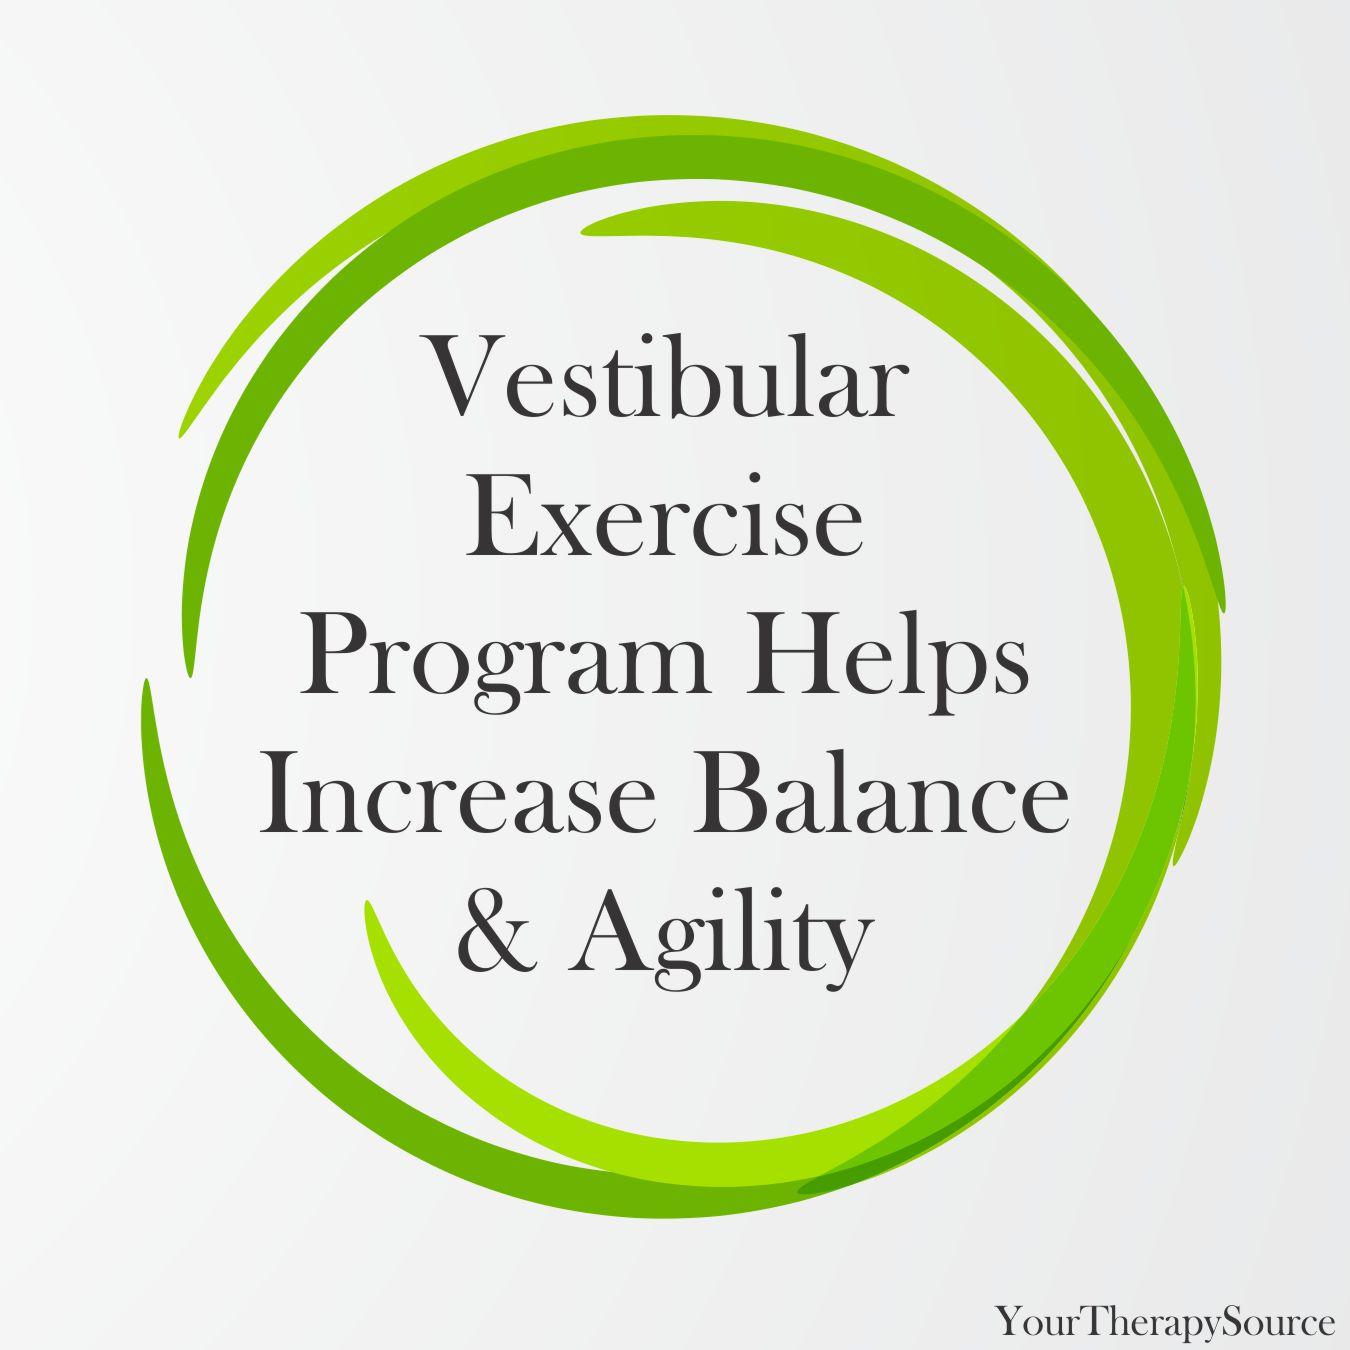 Vestibular Exercise Program Helps Increase Balance and Agility